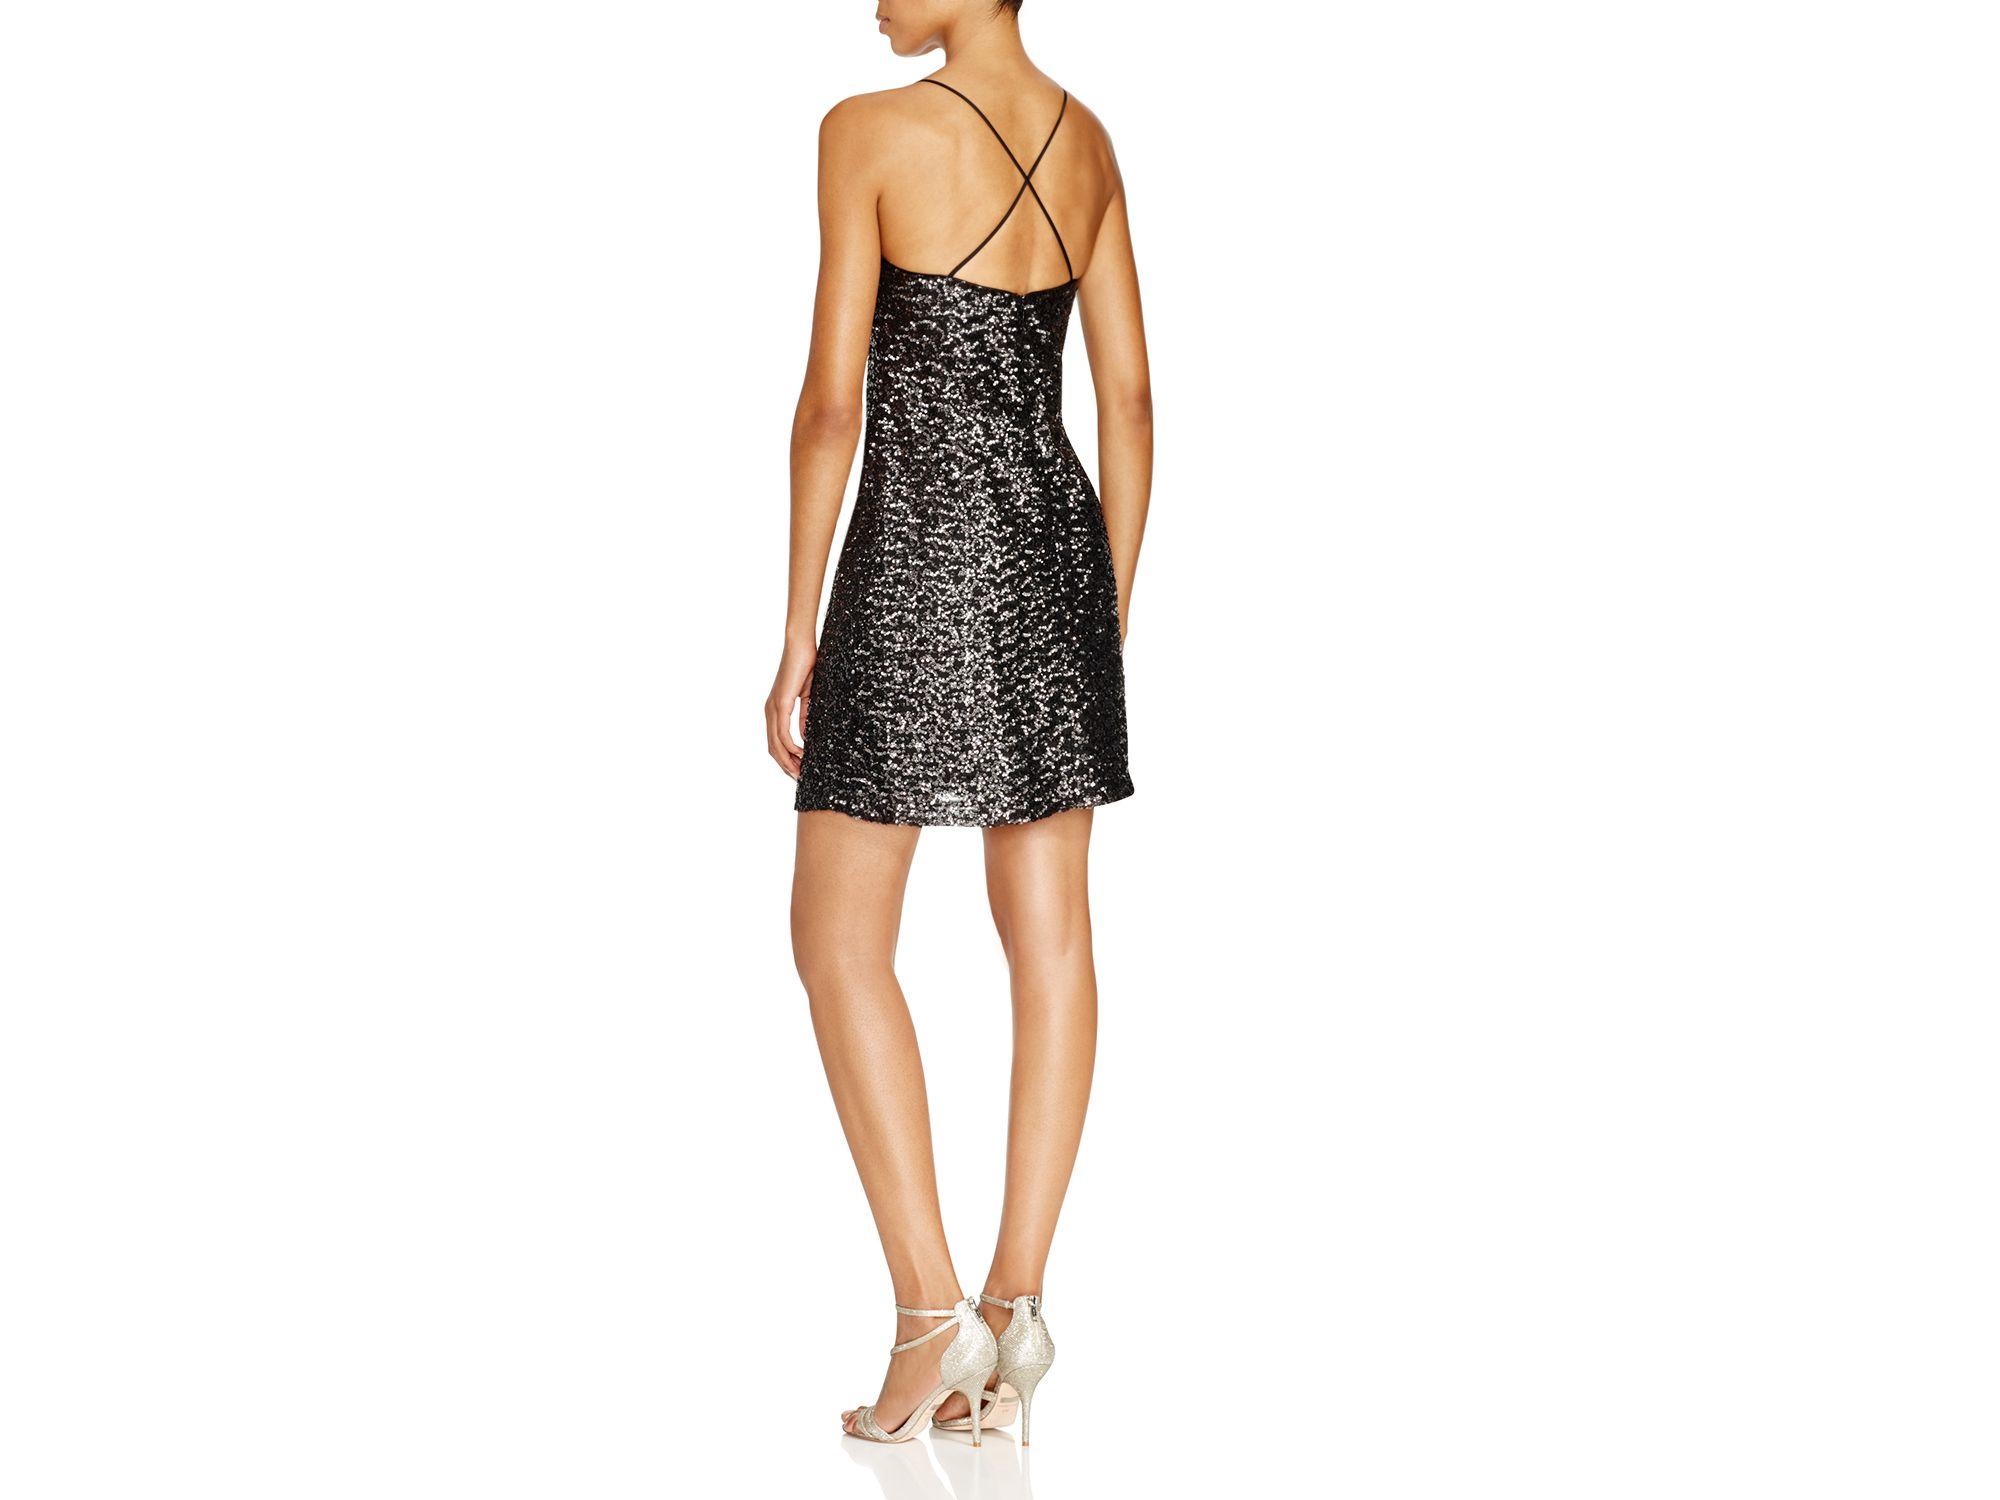 b787f49c7976 Vera Wang Sequin Slip Dress in Metallic - Lyst